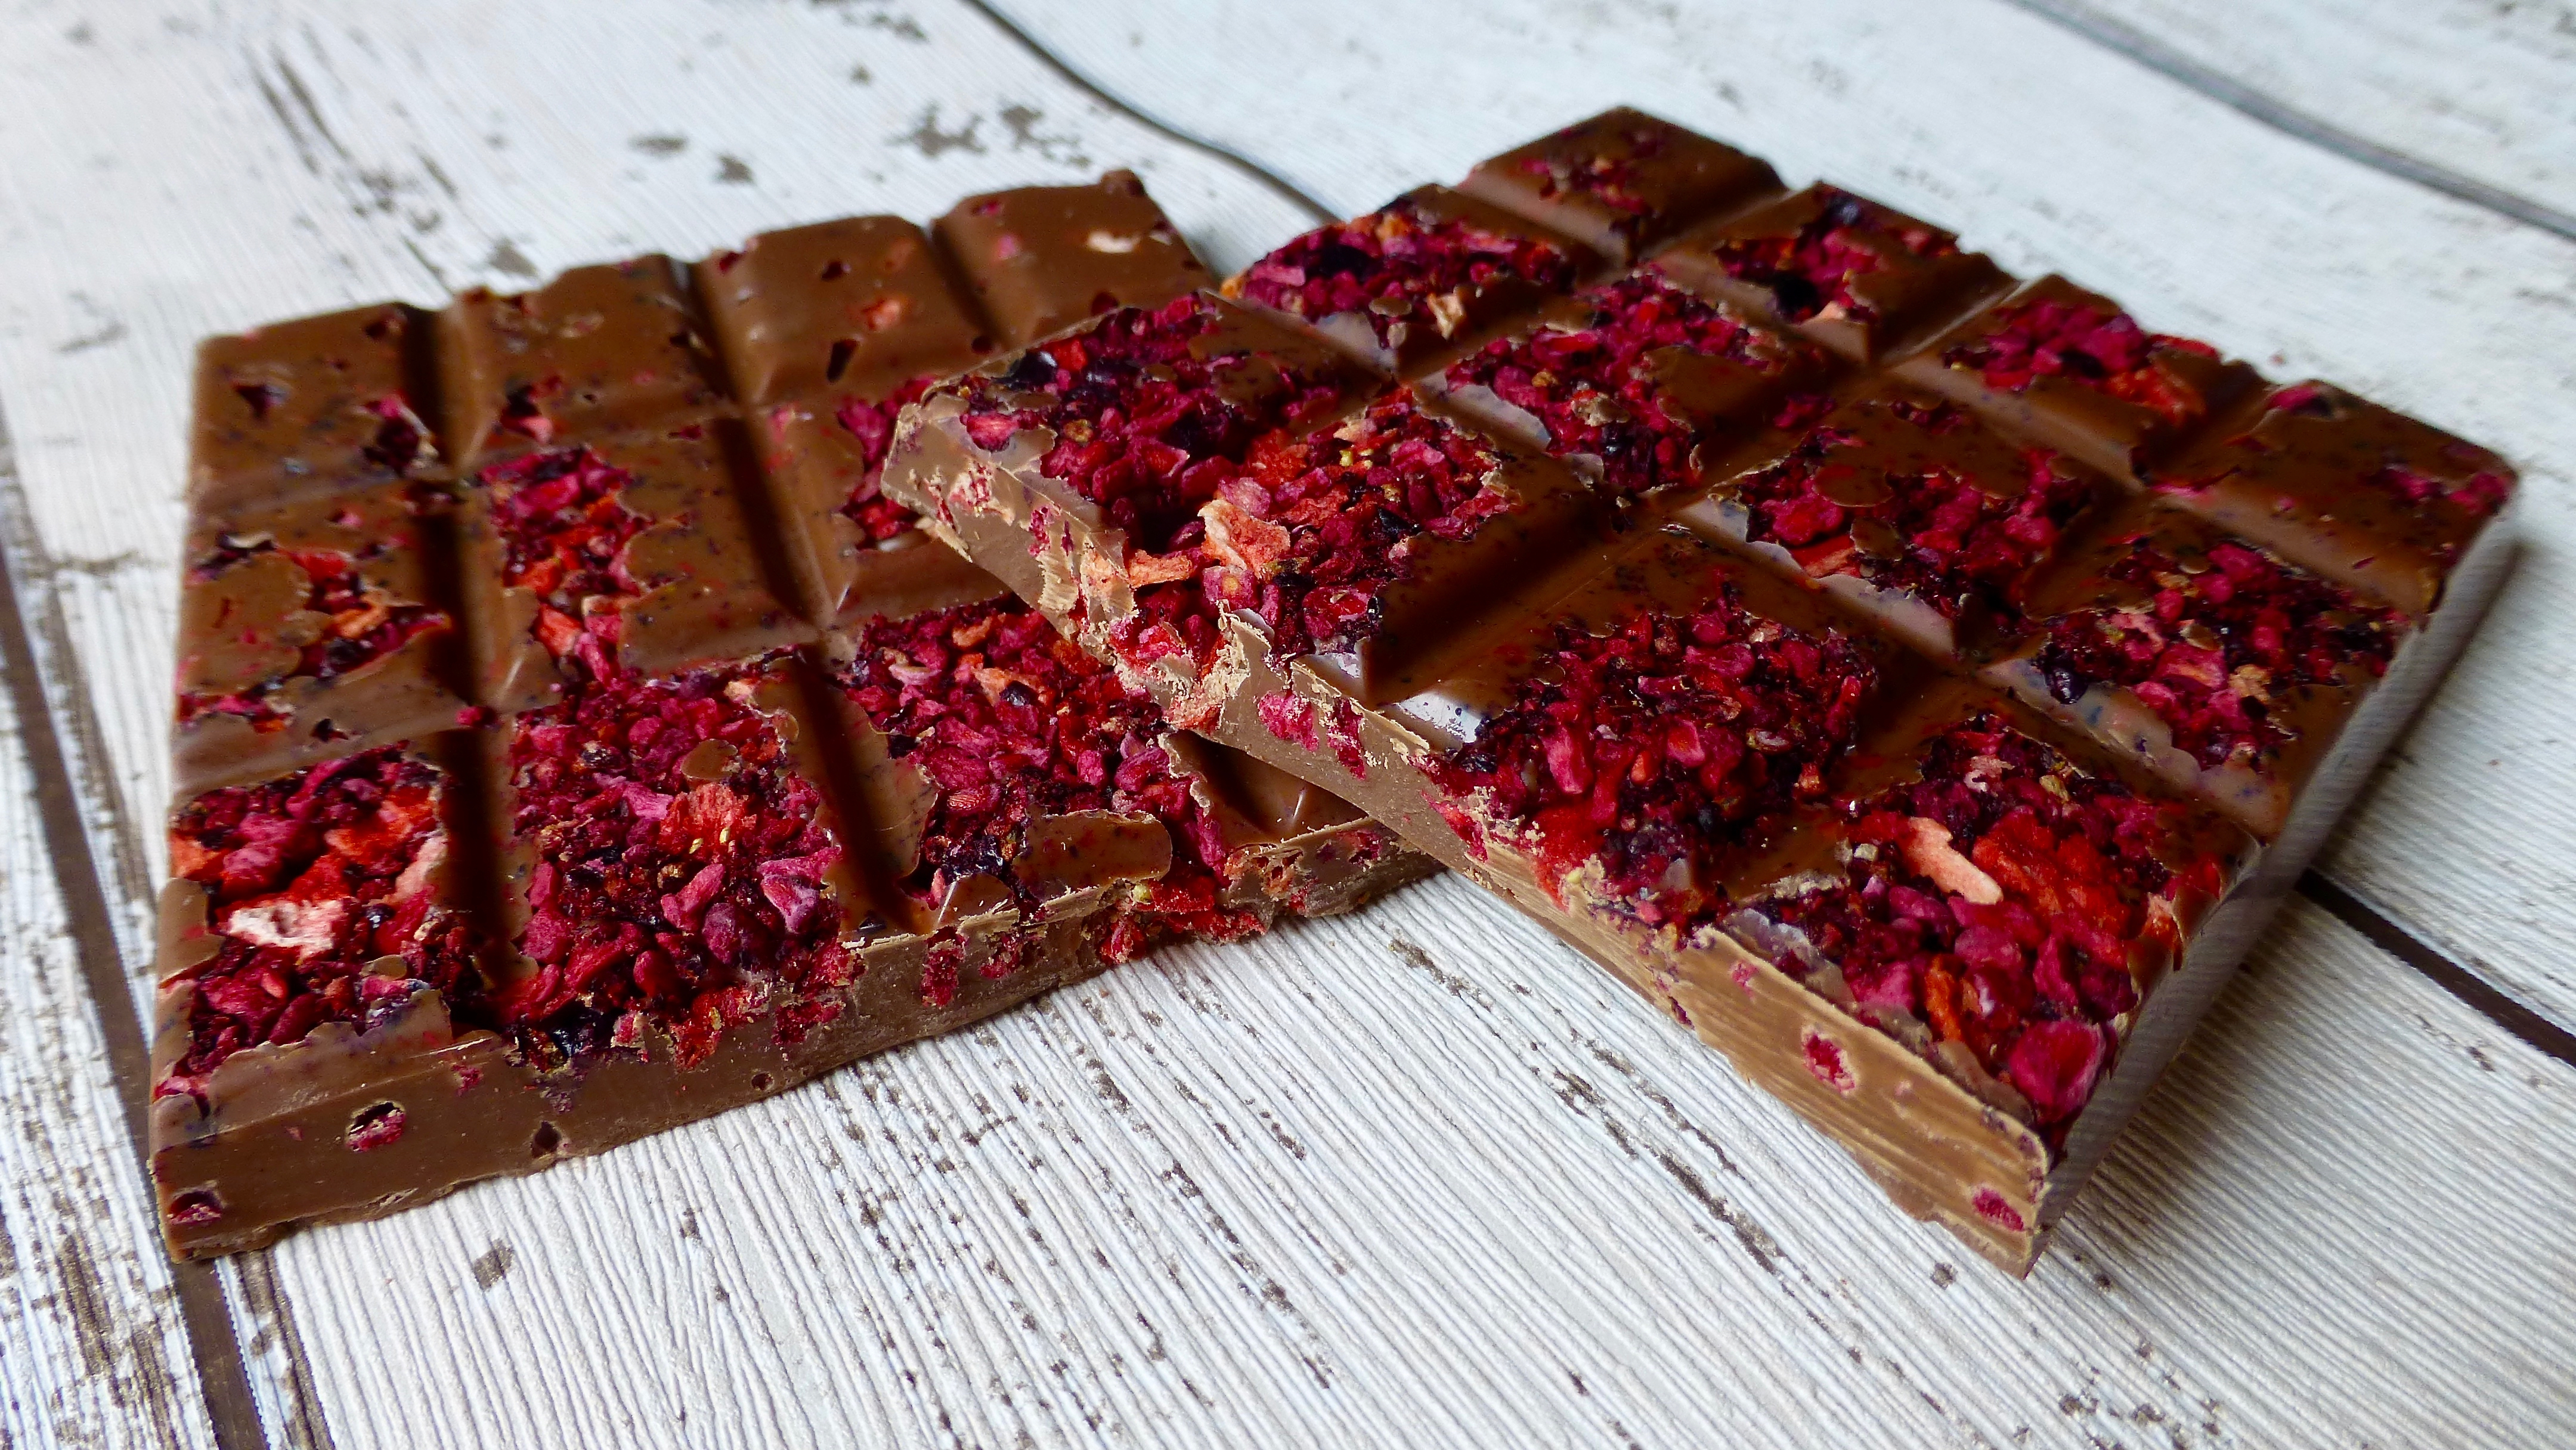 Beaulieu Chocolate Studio Forest Fruit